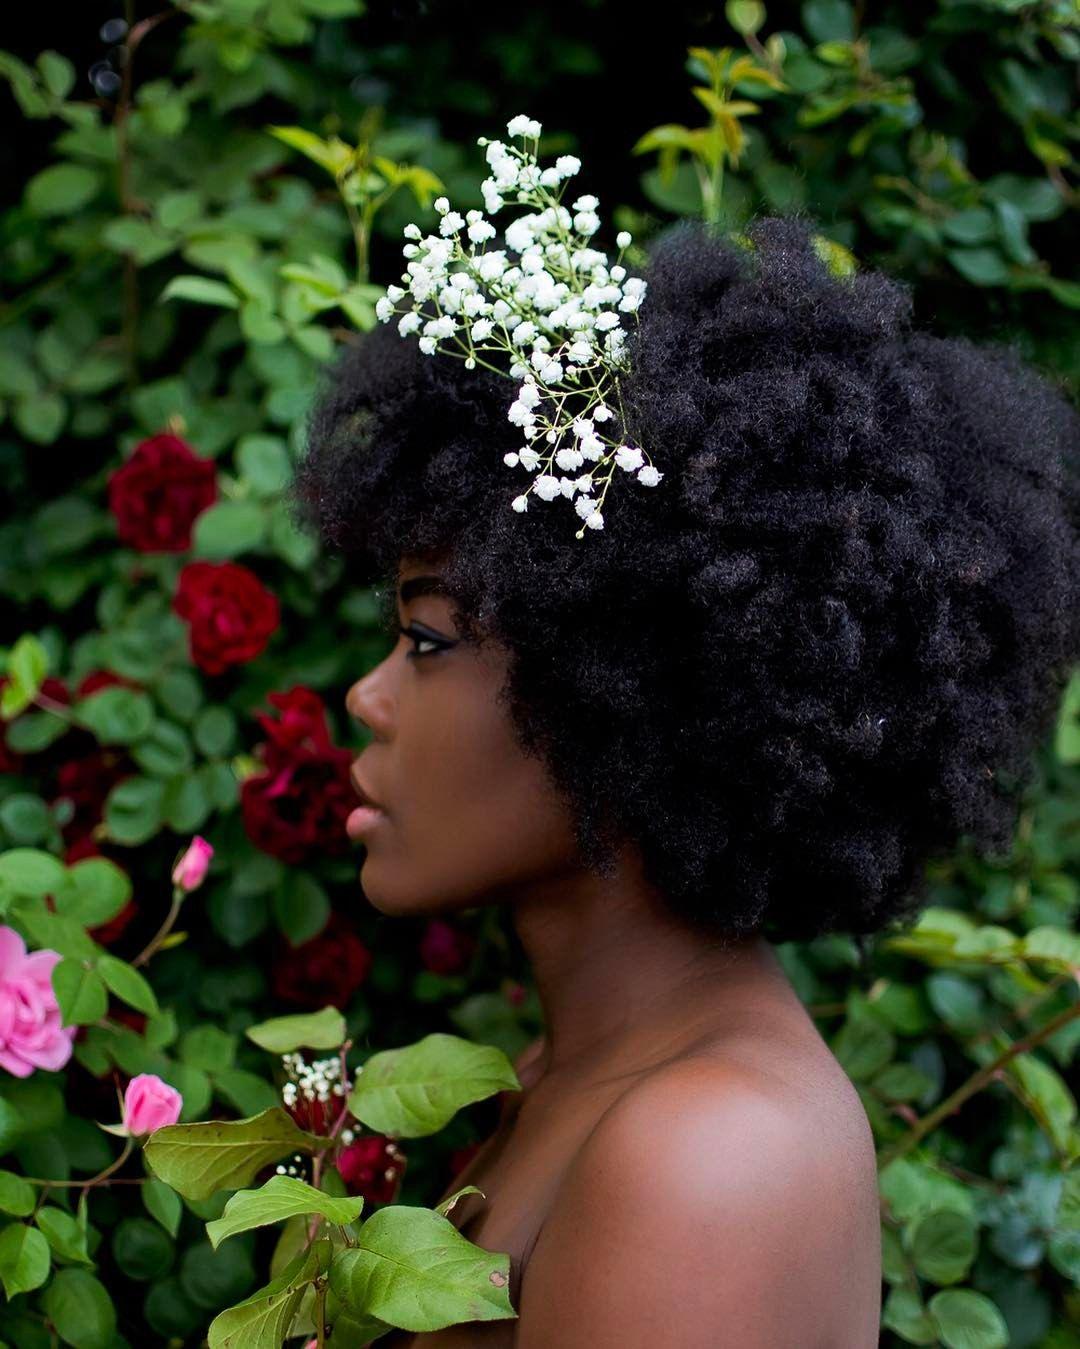 Simplycyn simplycyn afro hair natural hair kinky hair pretty simplycyn simplycyn afro hair natural hair kinky hair pretty izmirmasajfo Gallery